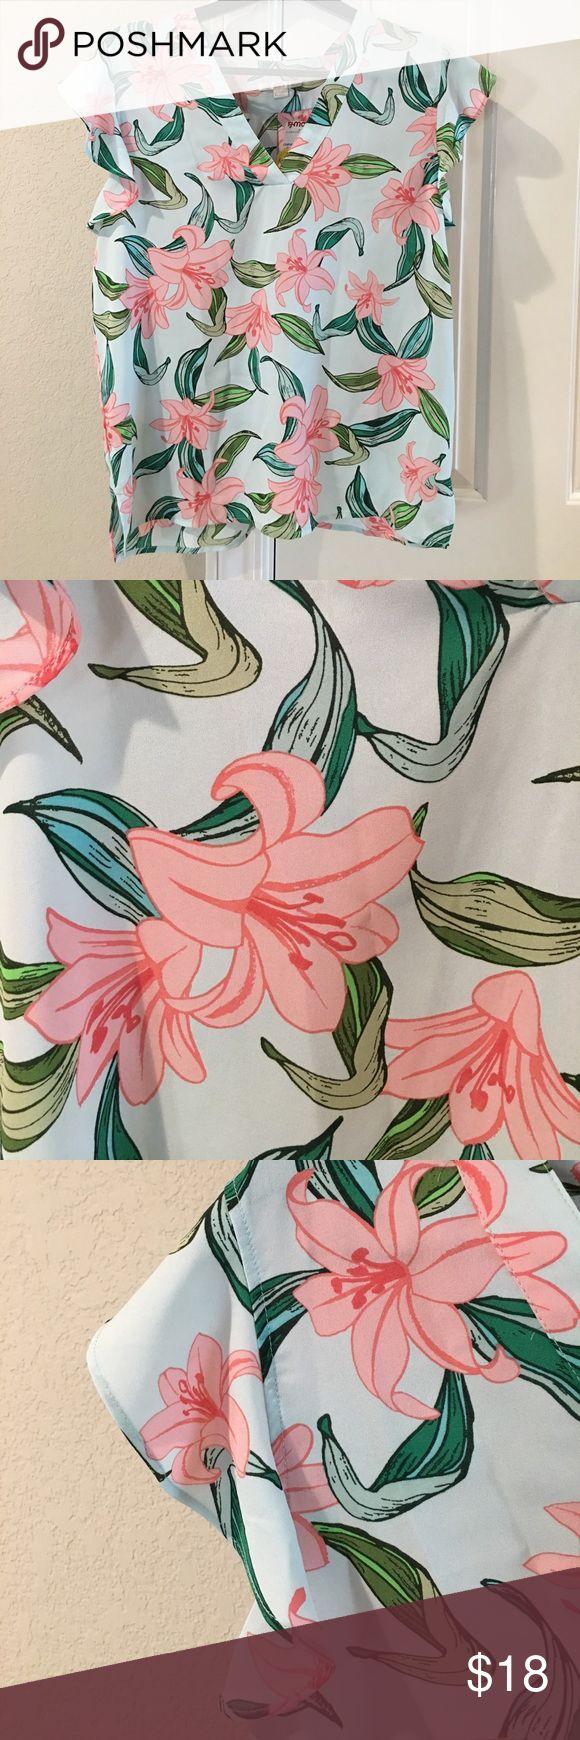 Super cool & cute hibiscus print blouse - New! XL I bought this super cute blouse, hibiscus print, perfect cool & Hawaiian and it didn't fit. SZ XL, new never worn (Q) c & e Tops Blouses